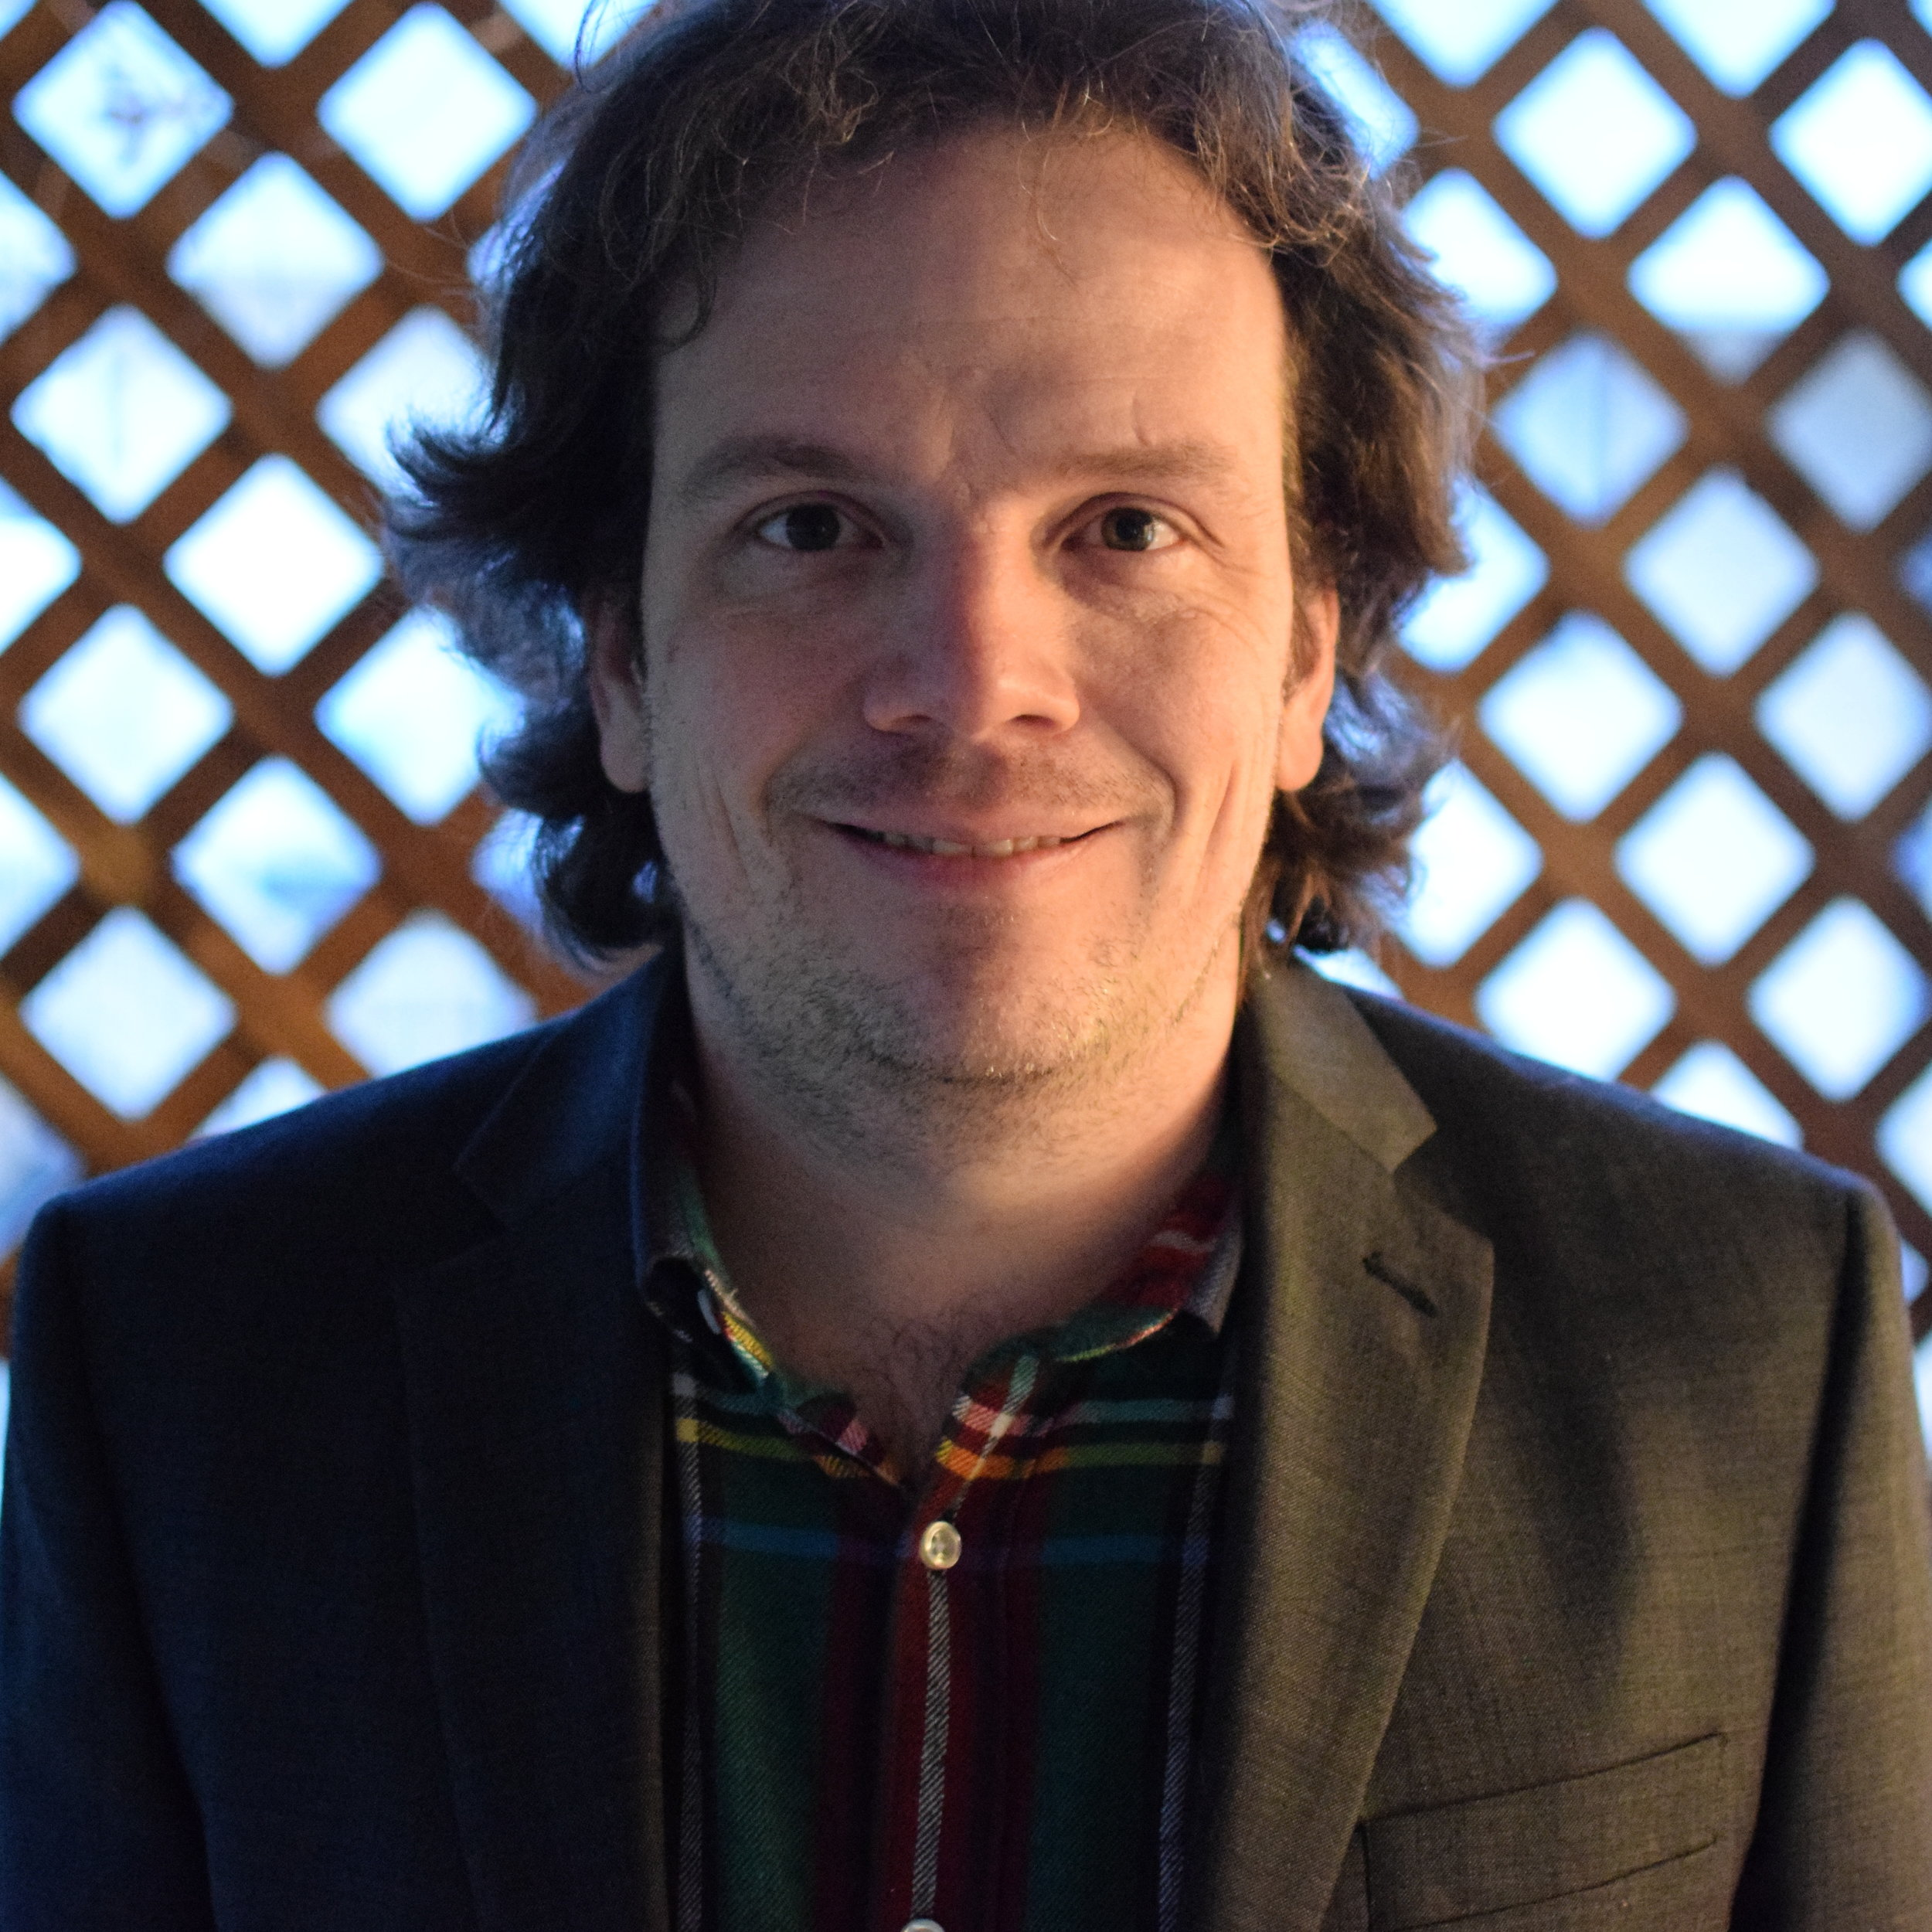 Julius Musseau, CTO, Mergebase